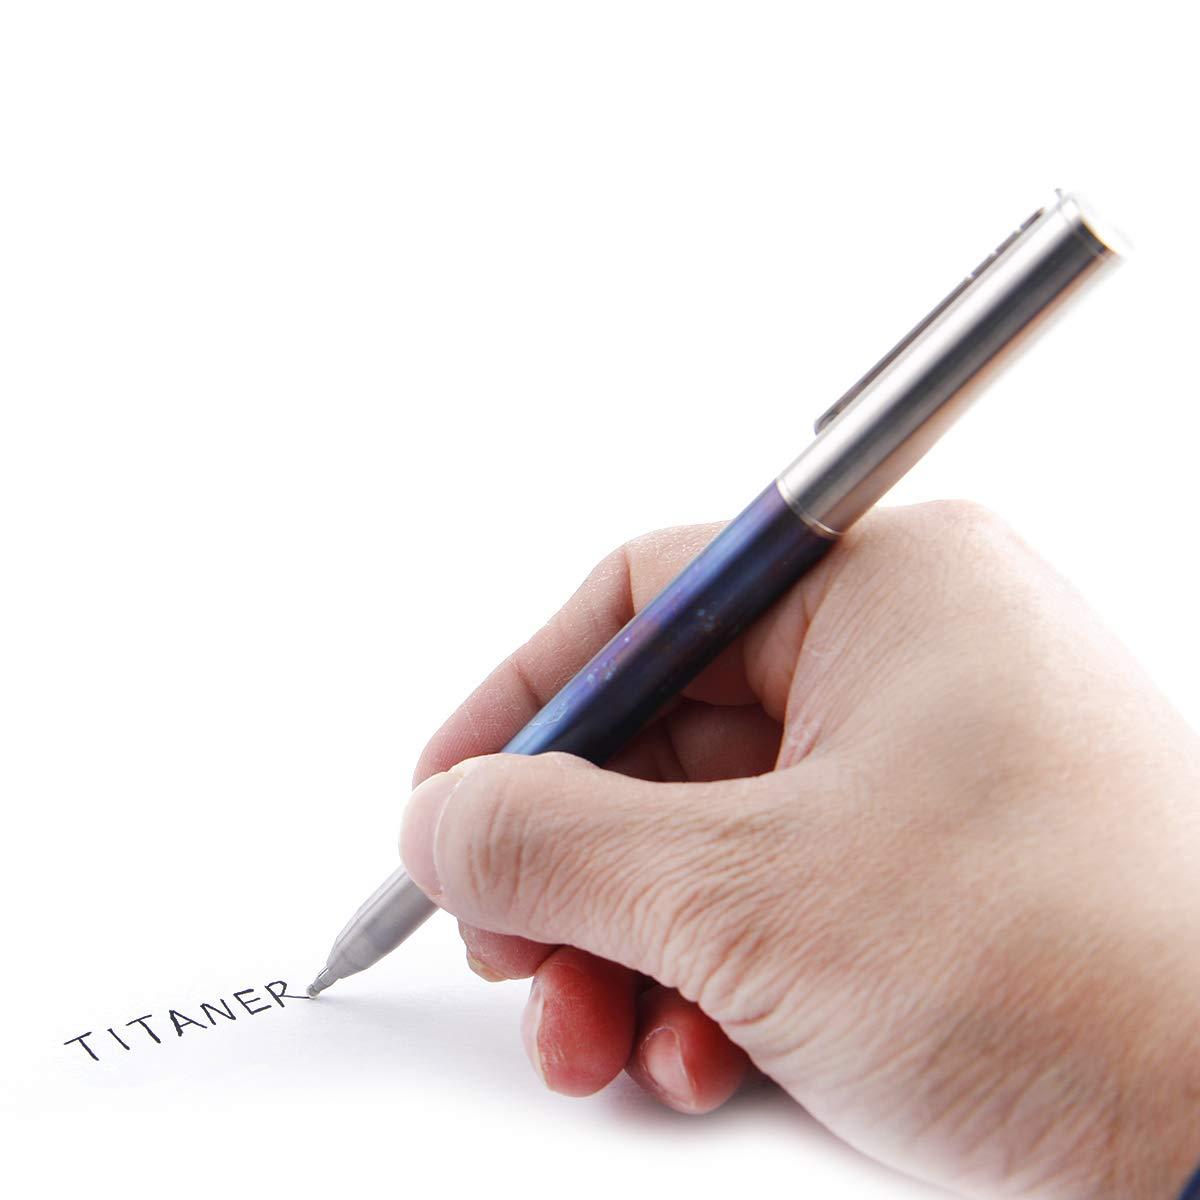 TITANER Icebreaker Titanium Lotus Tactical Pen Emergency Bolt Pen with Window Breaker(Blue) by TITANER (Image #2)